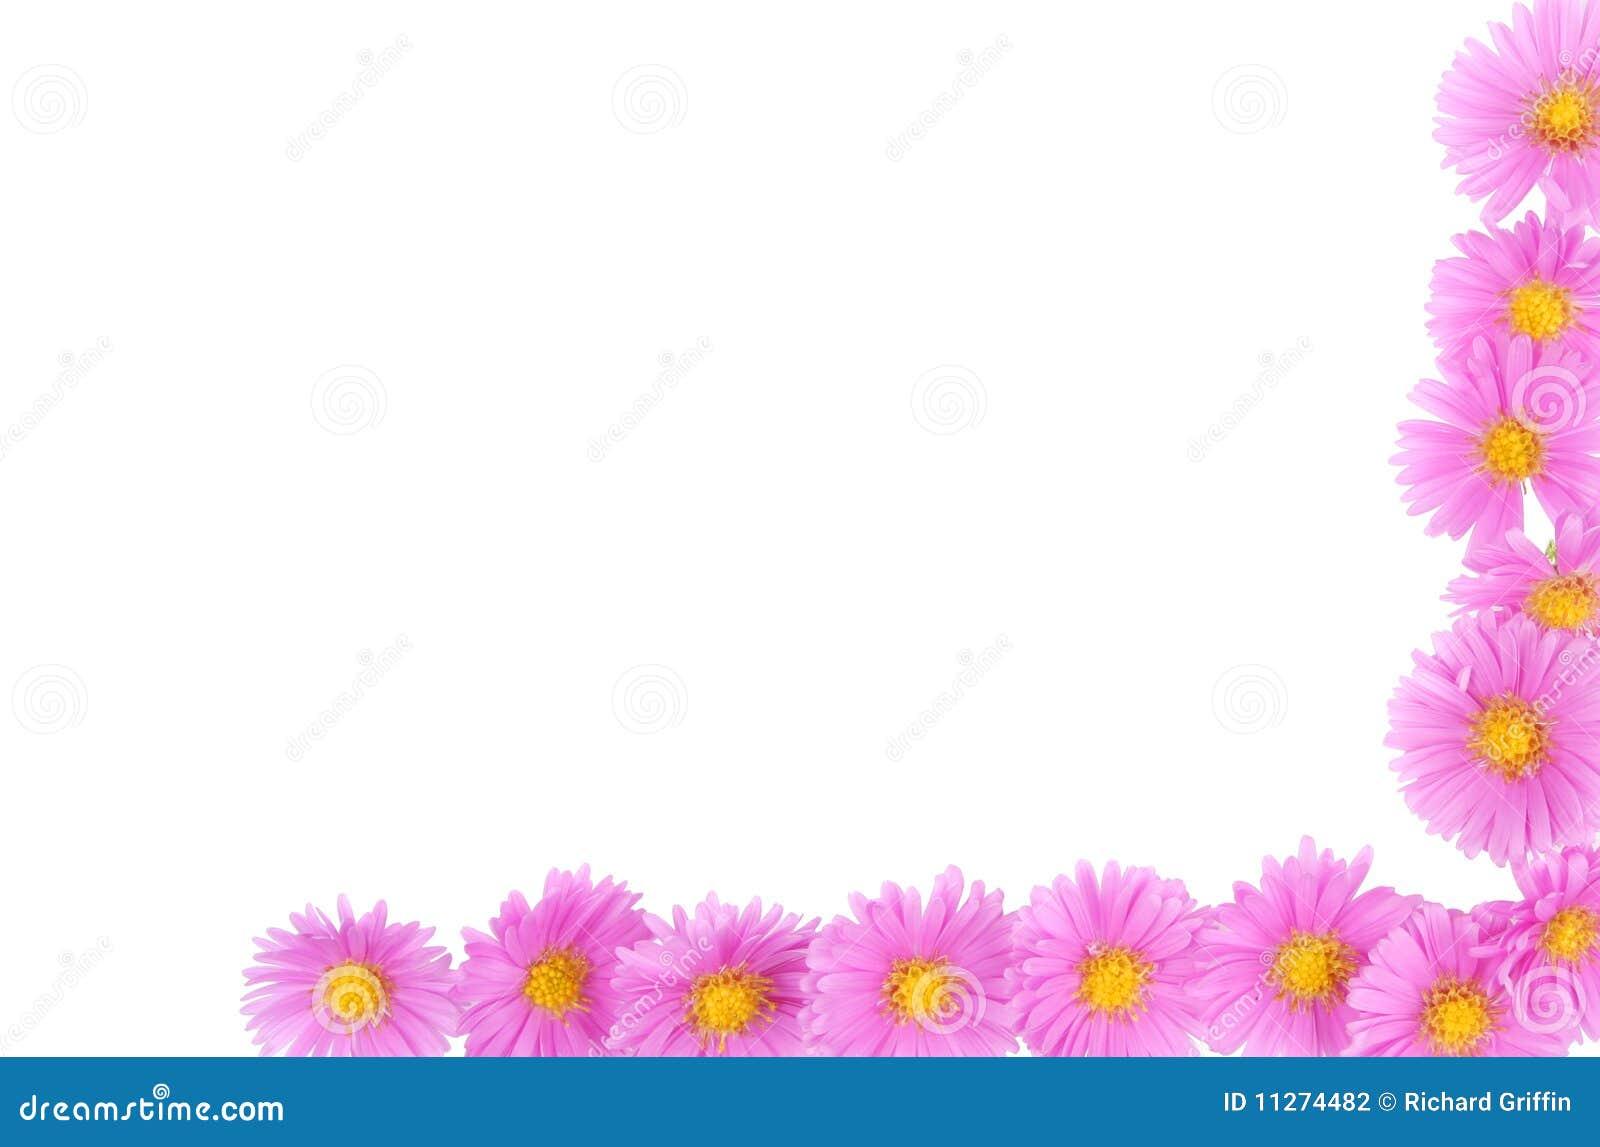 Daisy flower border stock photo image of aster flower 11274482 daisy flower border izmirmasajfo